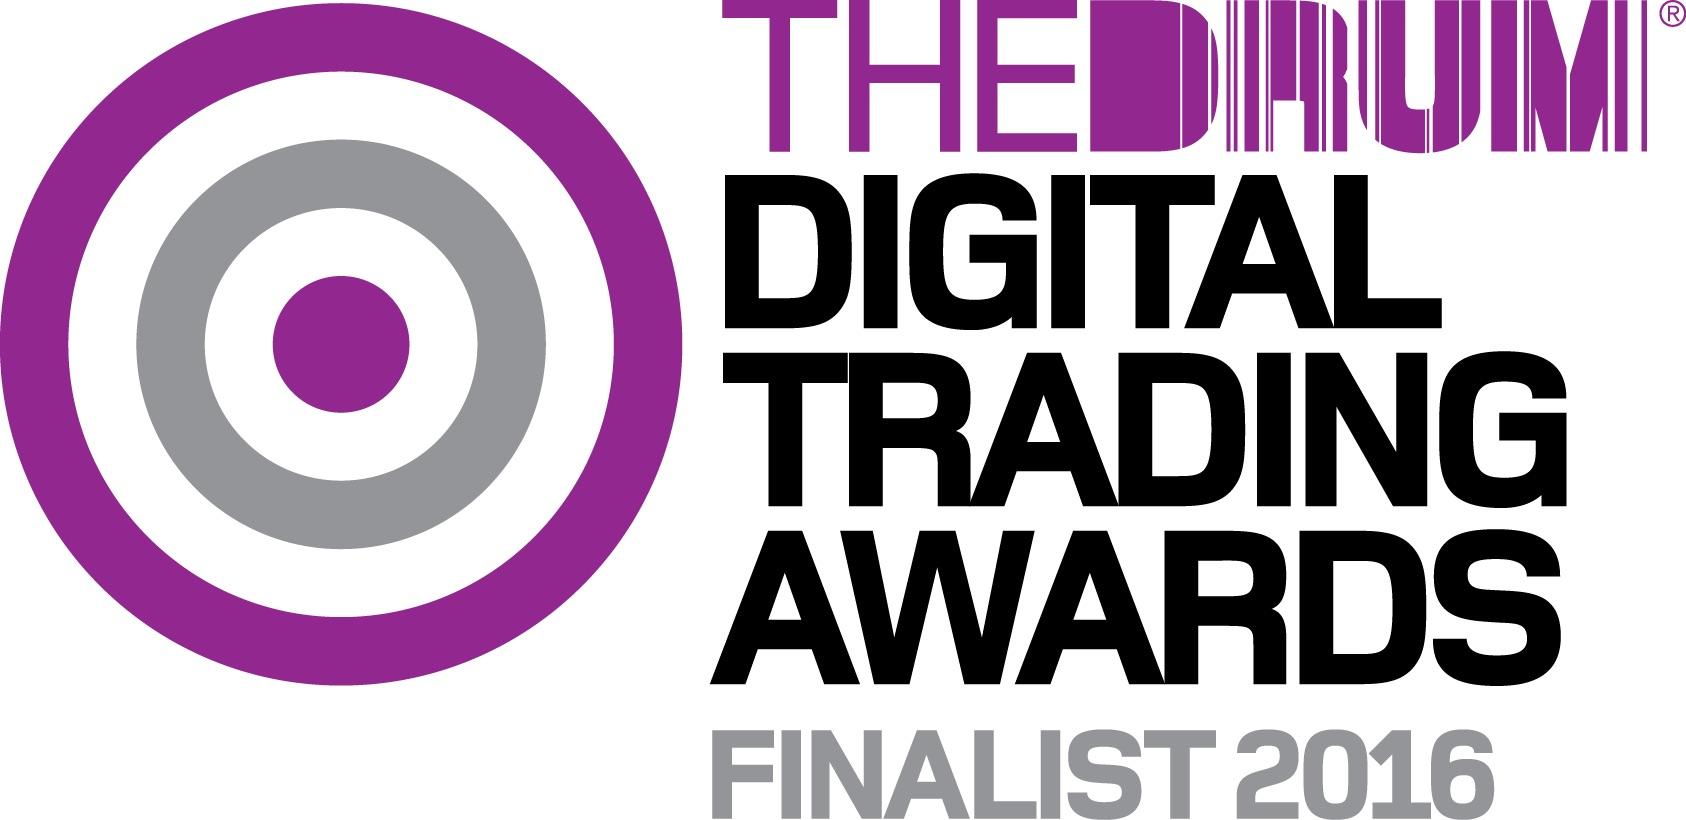 Drum Digital Trading Awards - Finalist